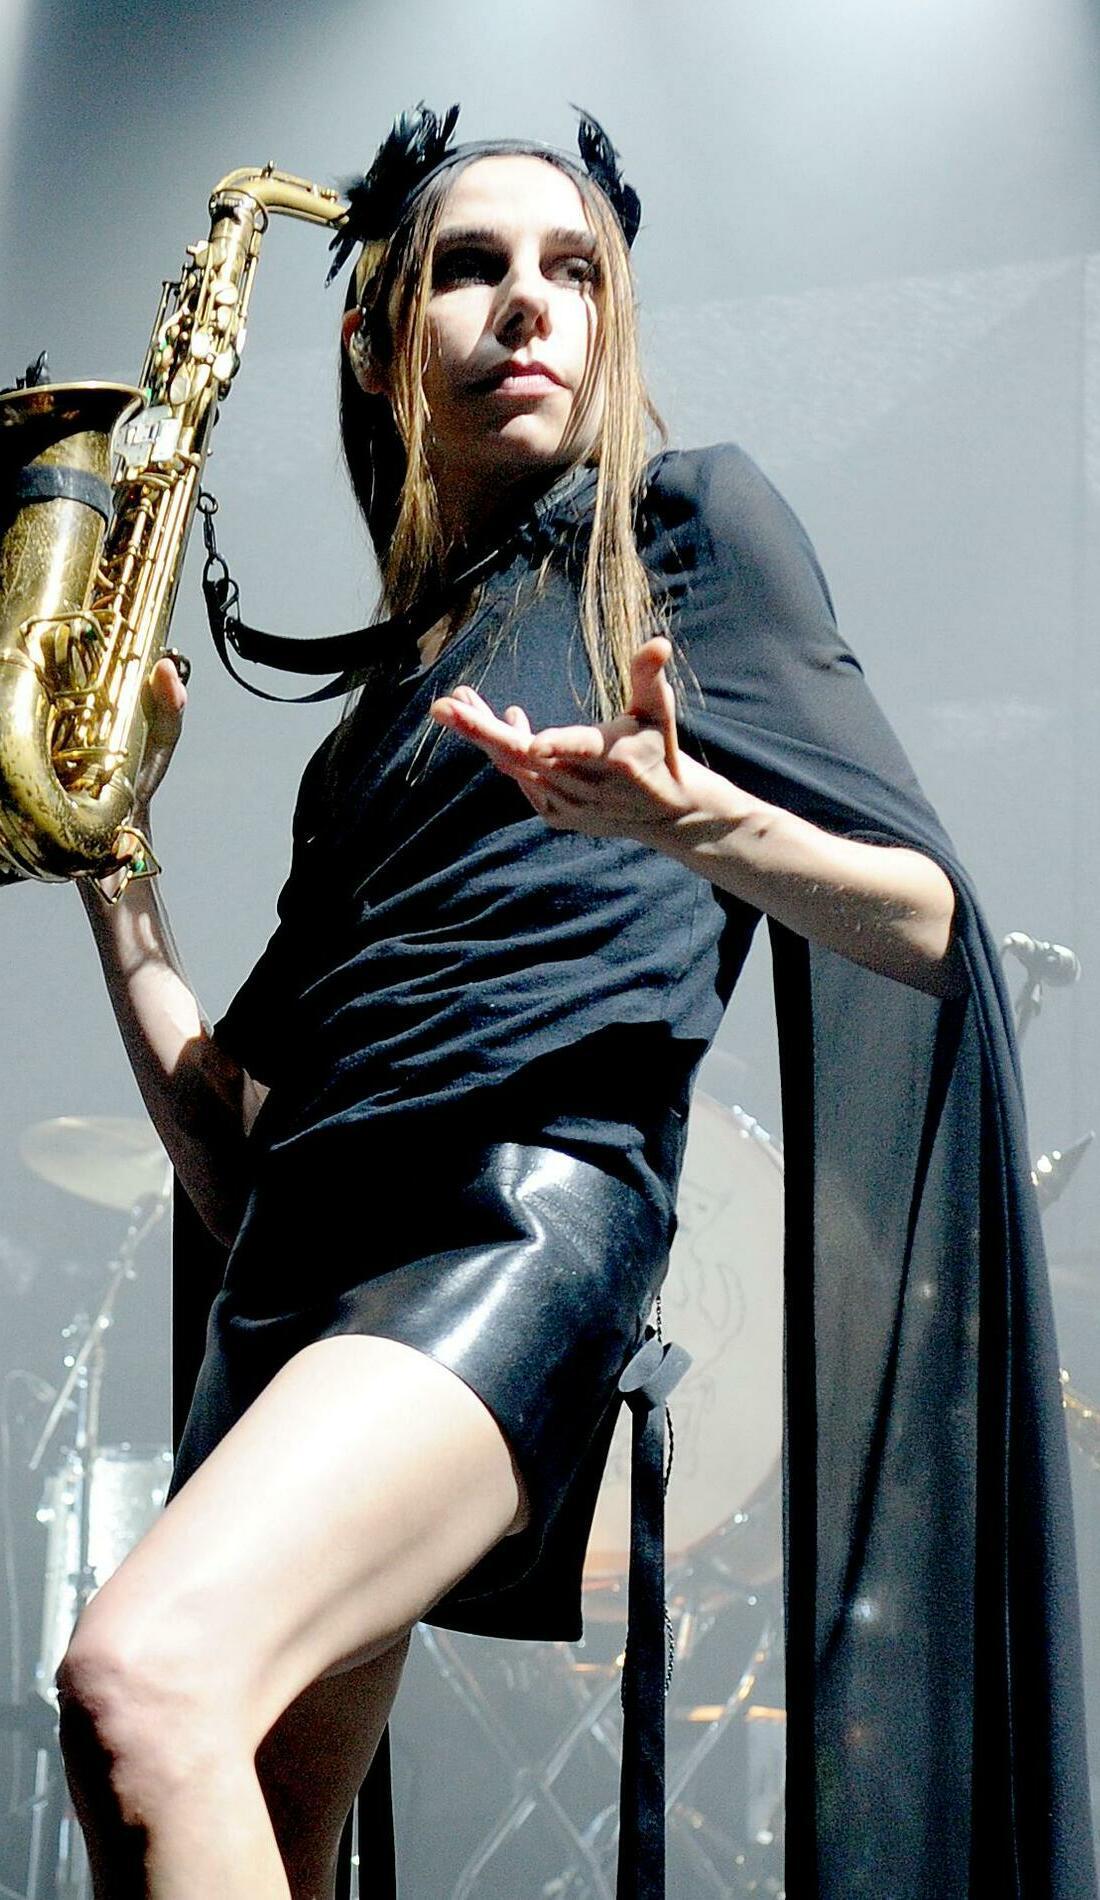 A PJ Harvey live event